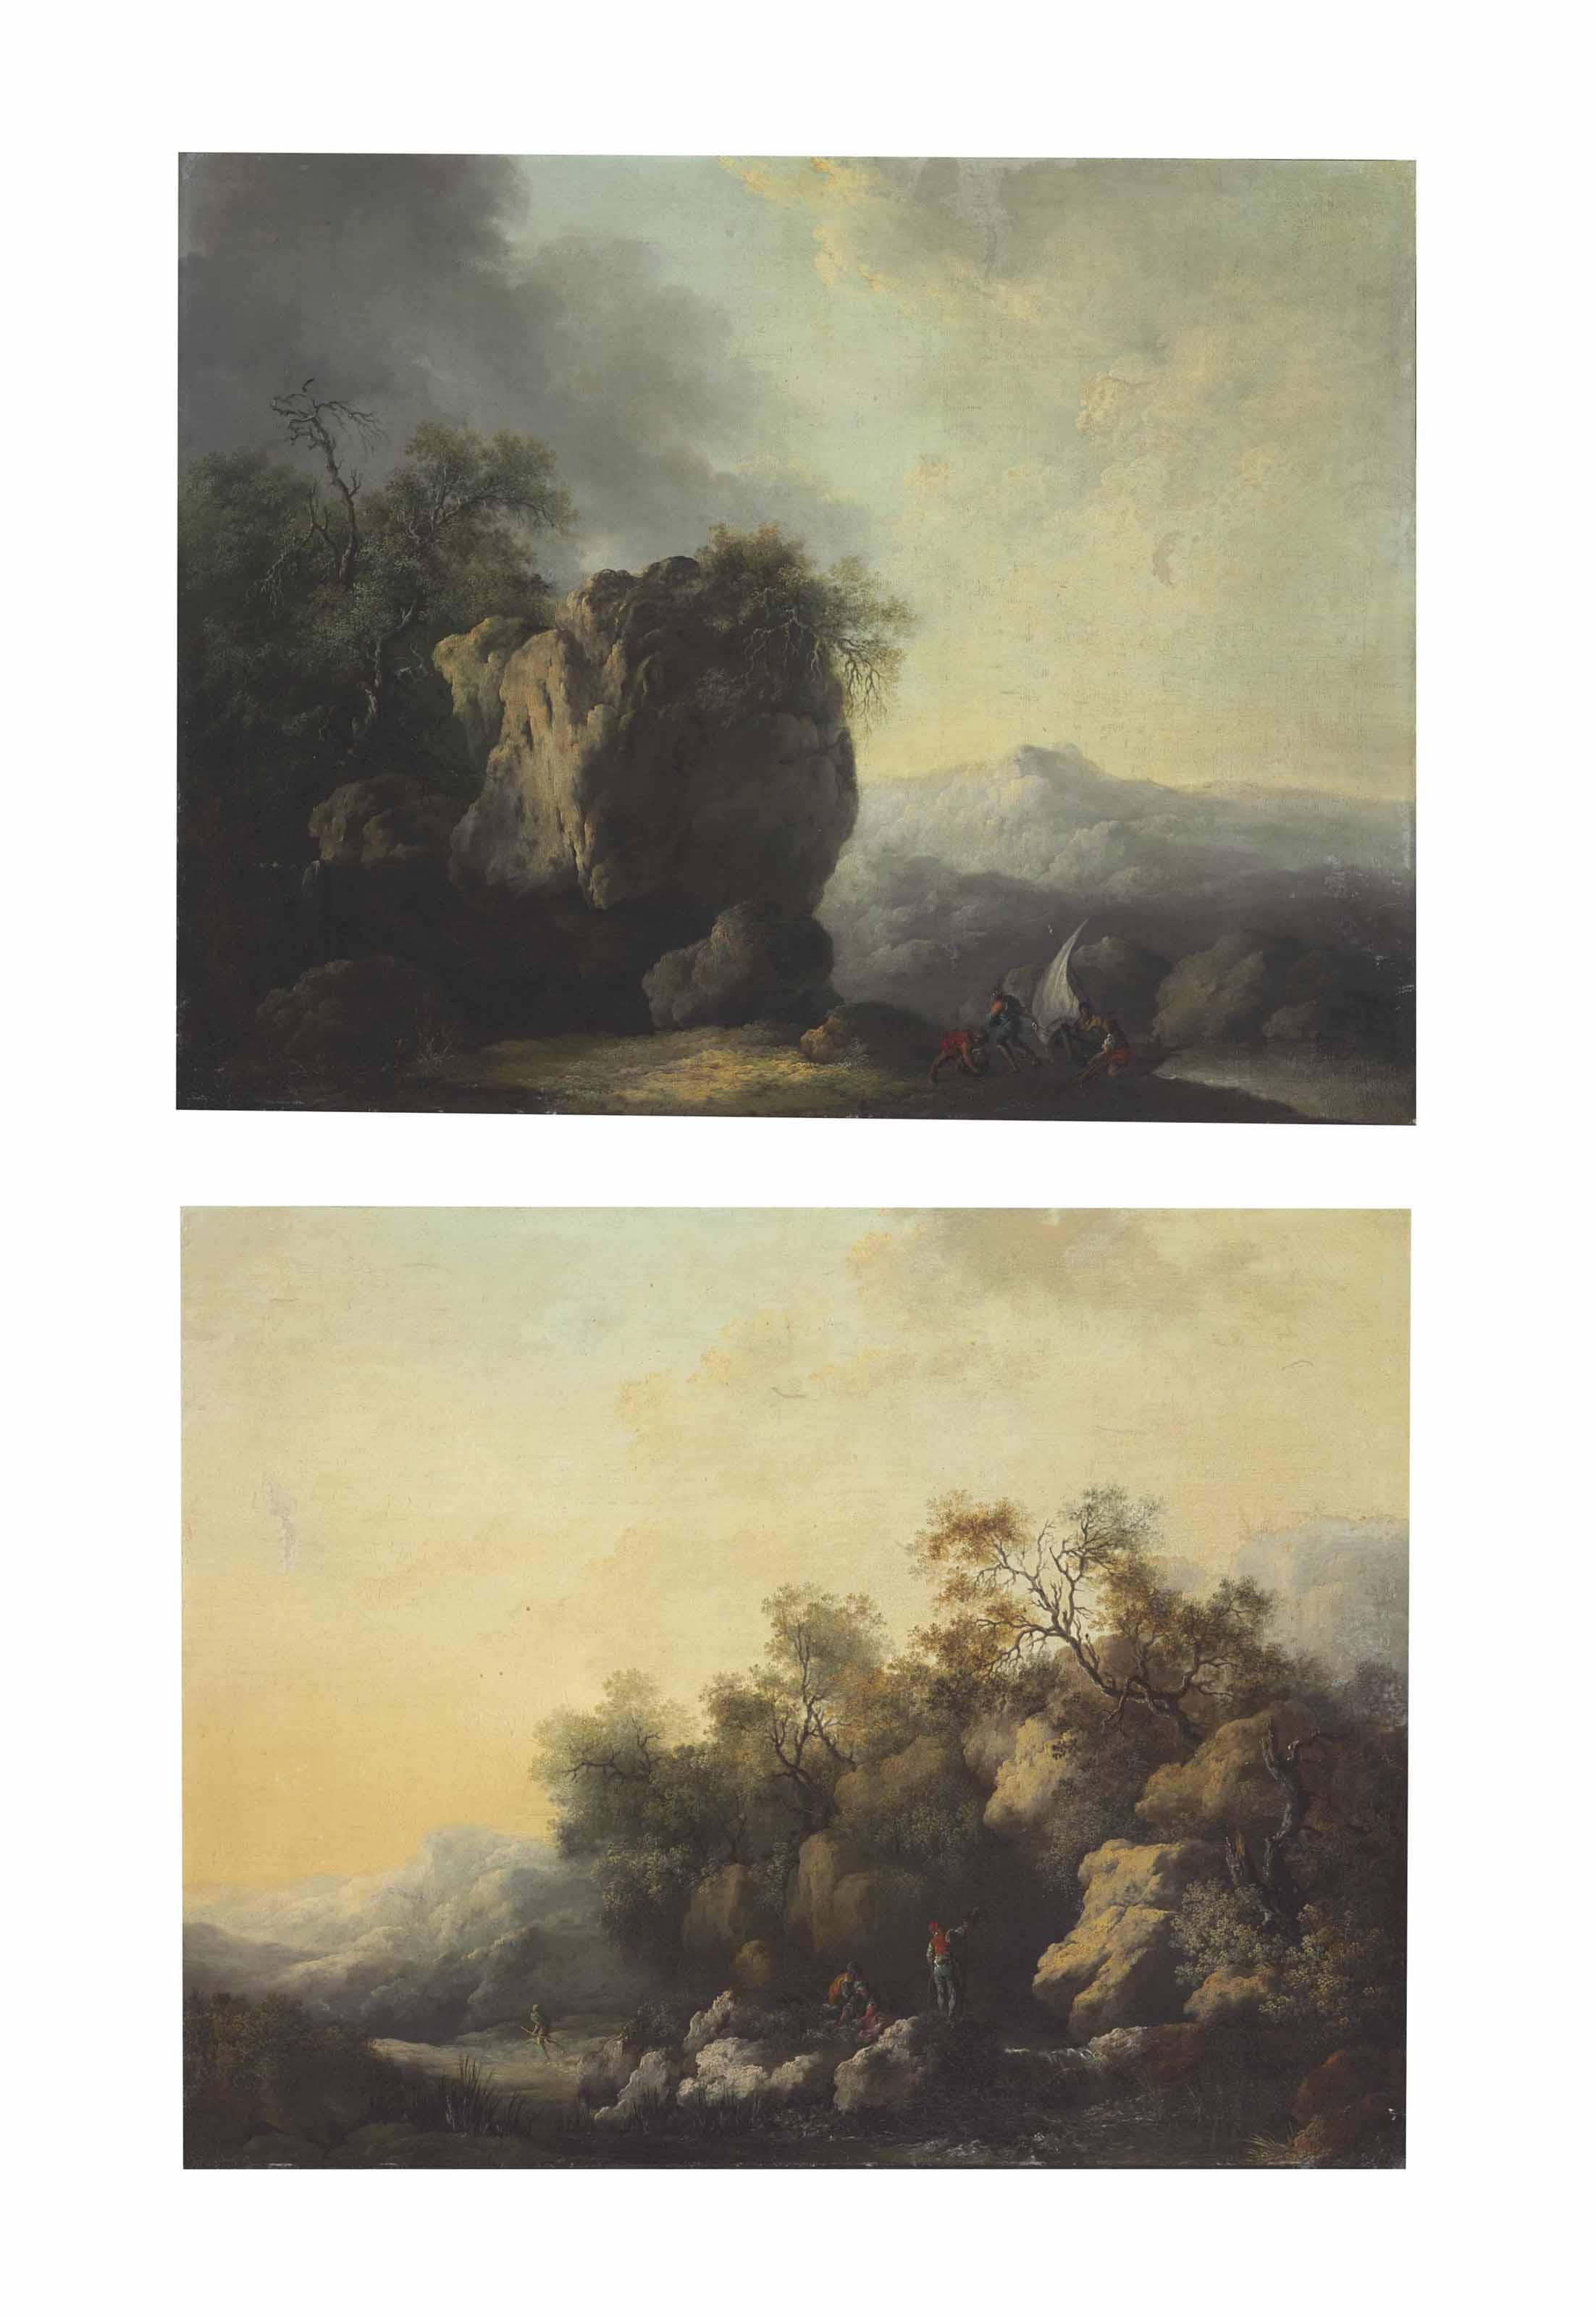 A rocky landscape with fishermen pulling a boat ashore; and A rocky landscape with figures standing beside a stream